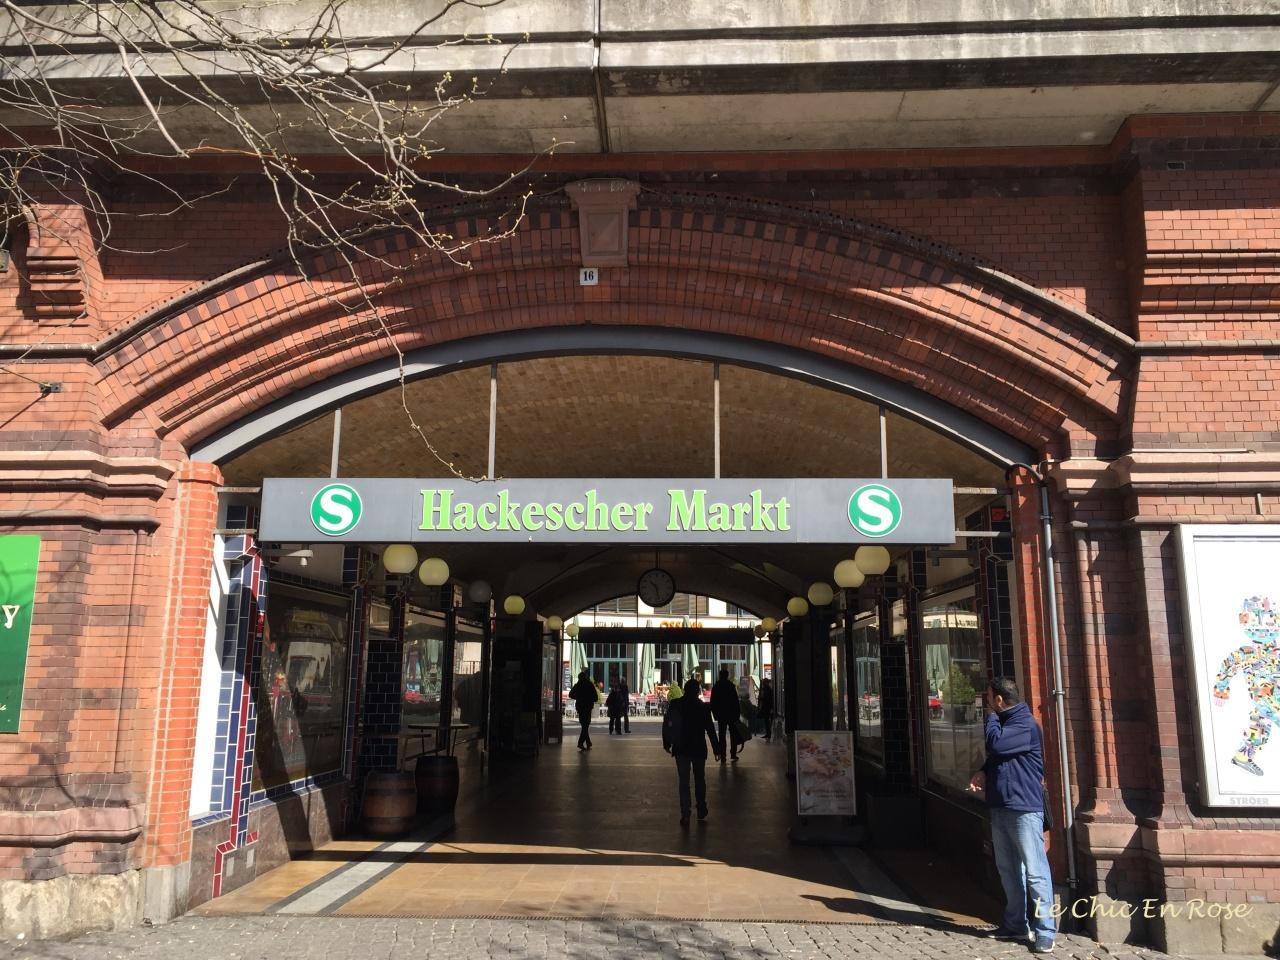 Hackescher Markt S Bahn Entrance Berlin